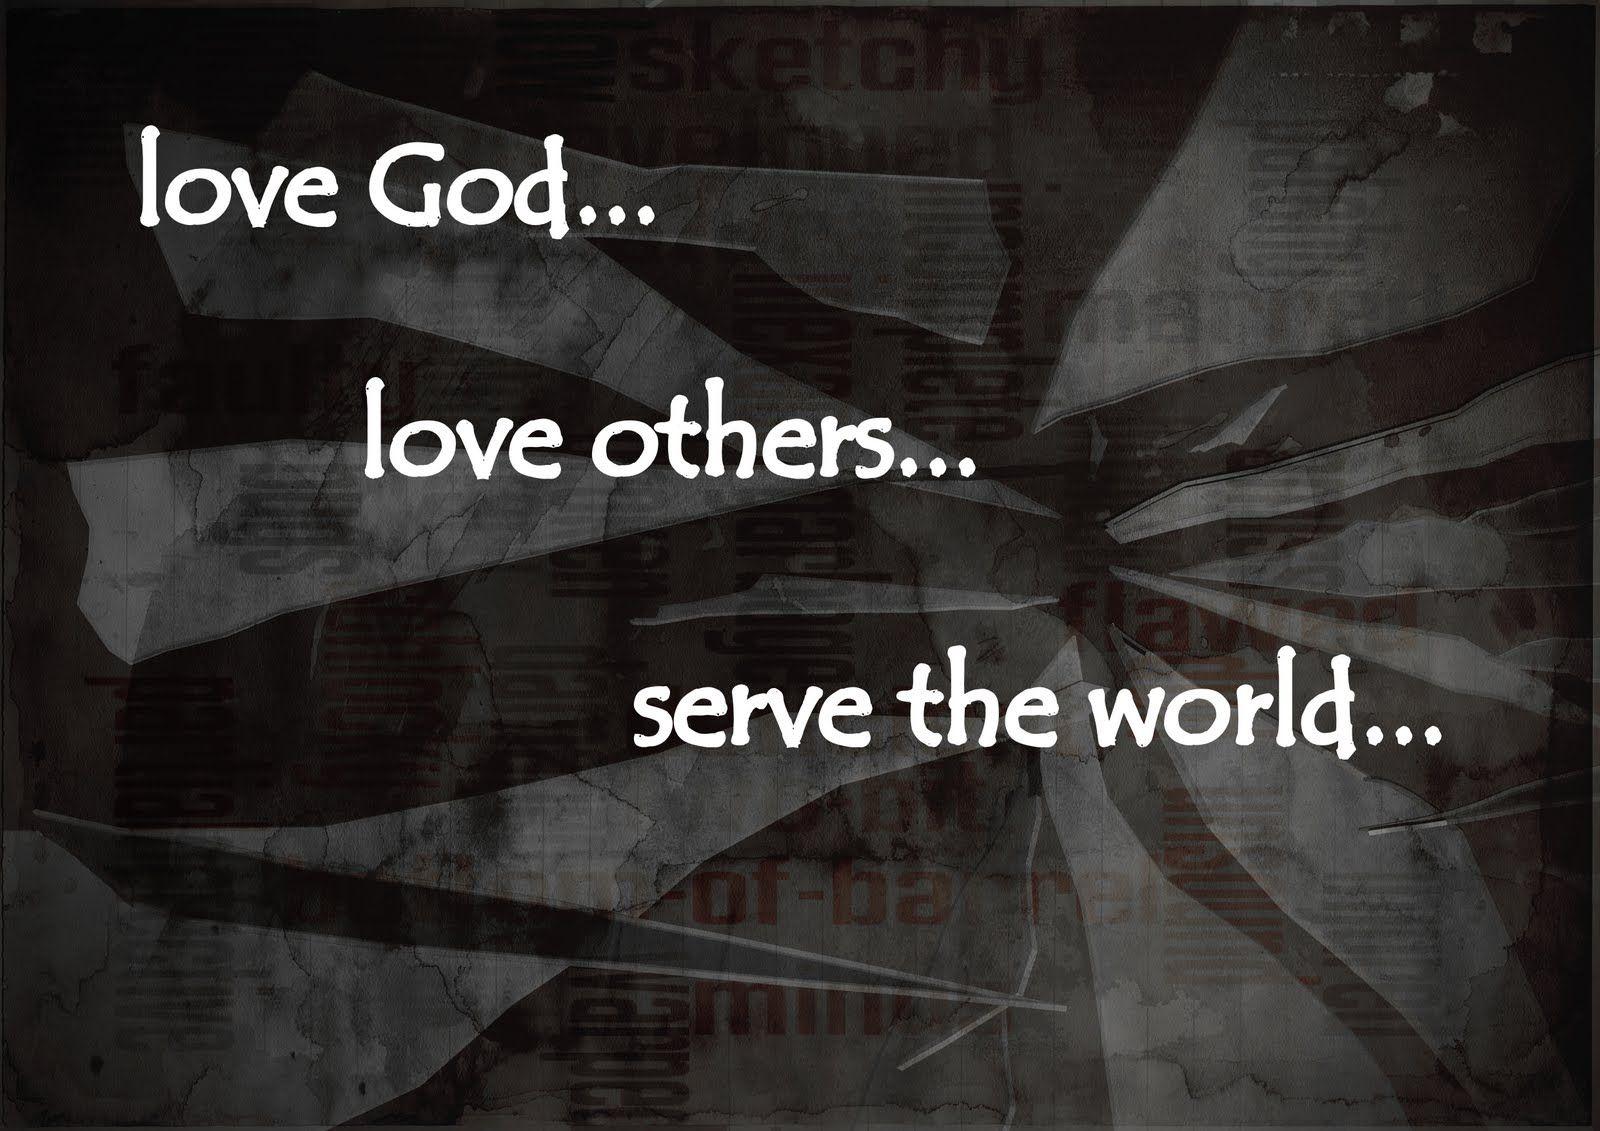 Must see Wallpaper Love God - 0ccd01adb8a31a09393d0ecdedab2ac0  Gallery_14390.jpg